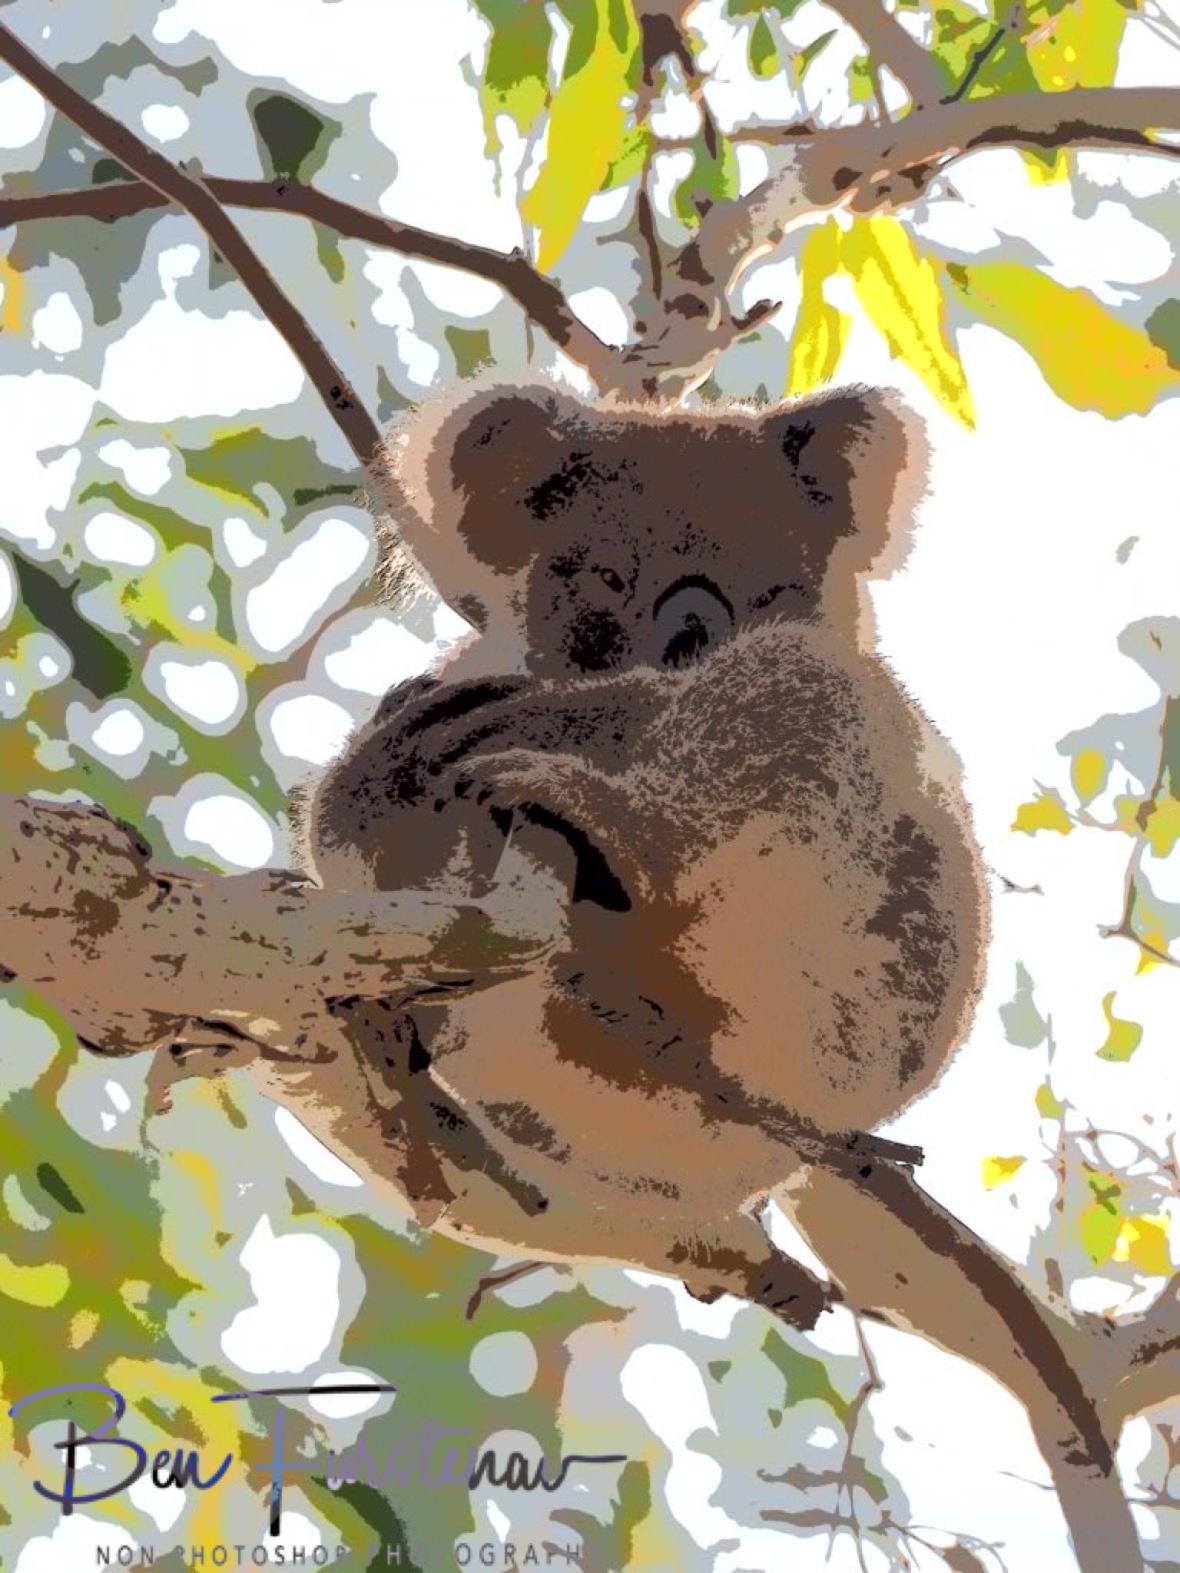 Sleepy koala at Woodburn, Northern New South Wales, Australia